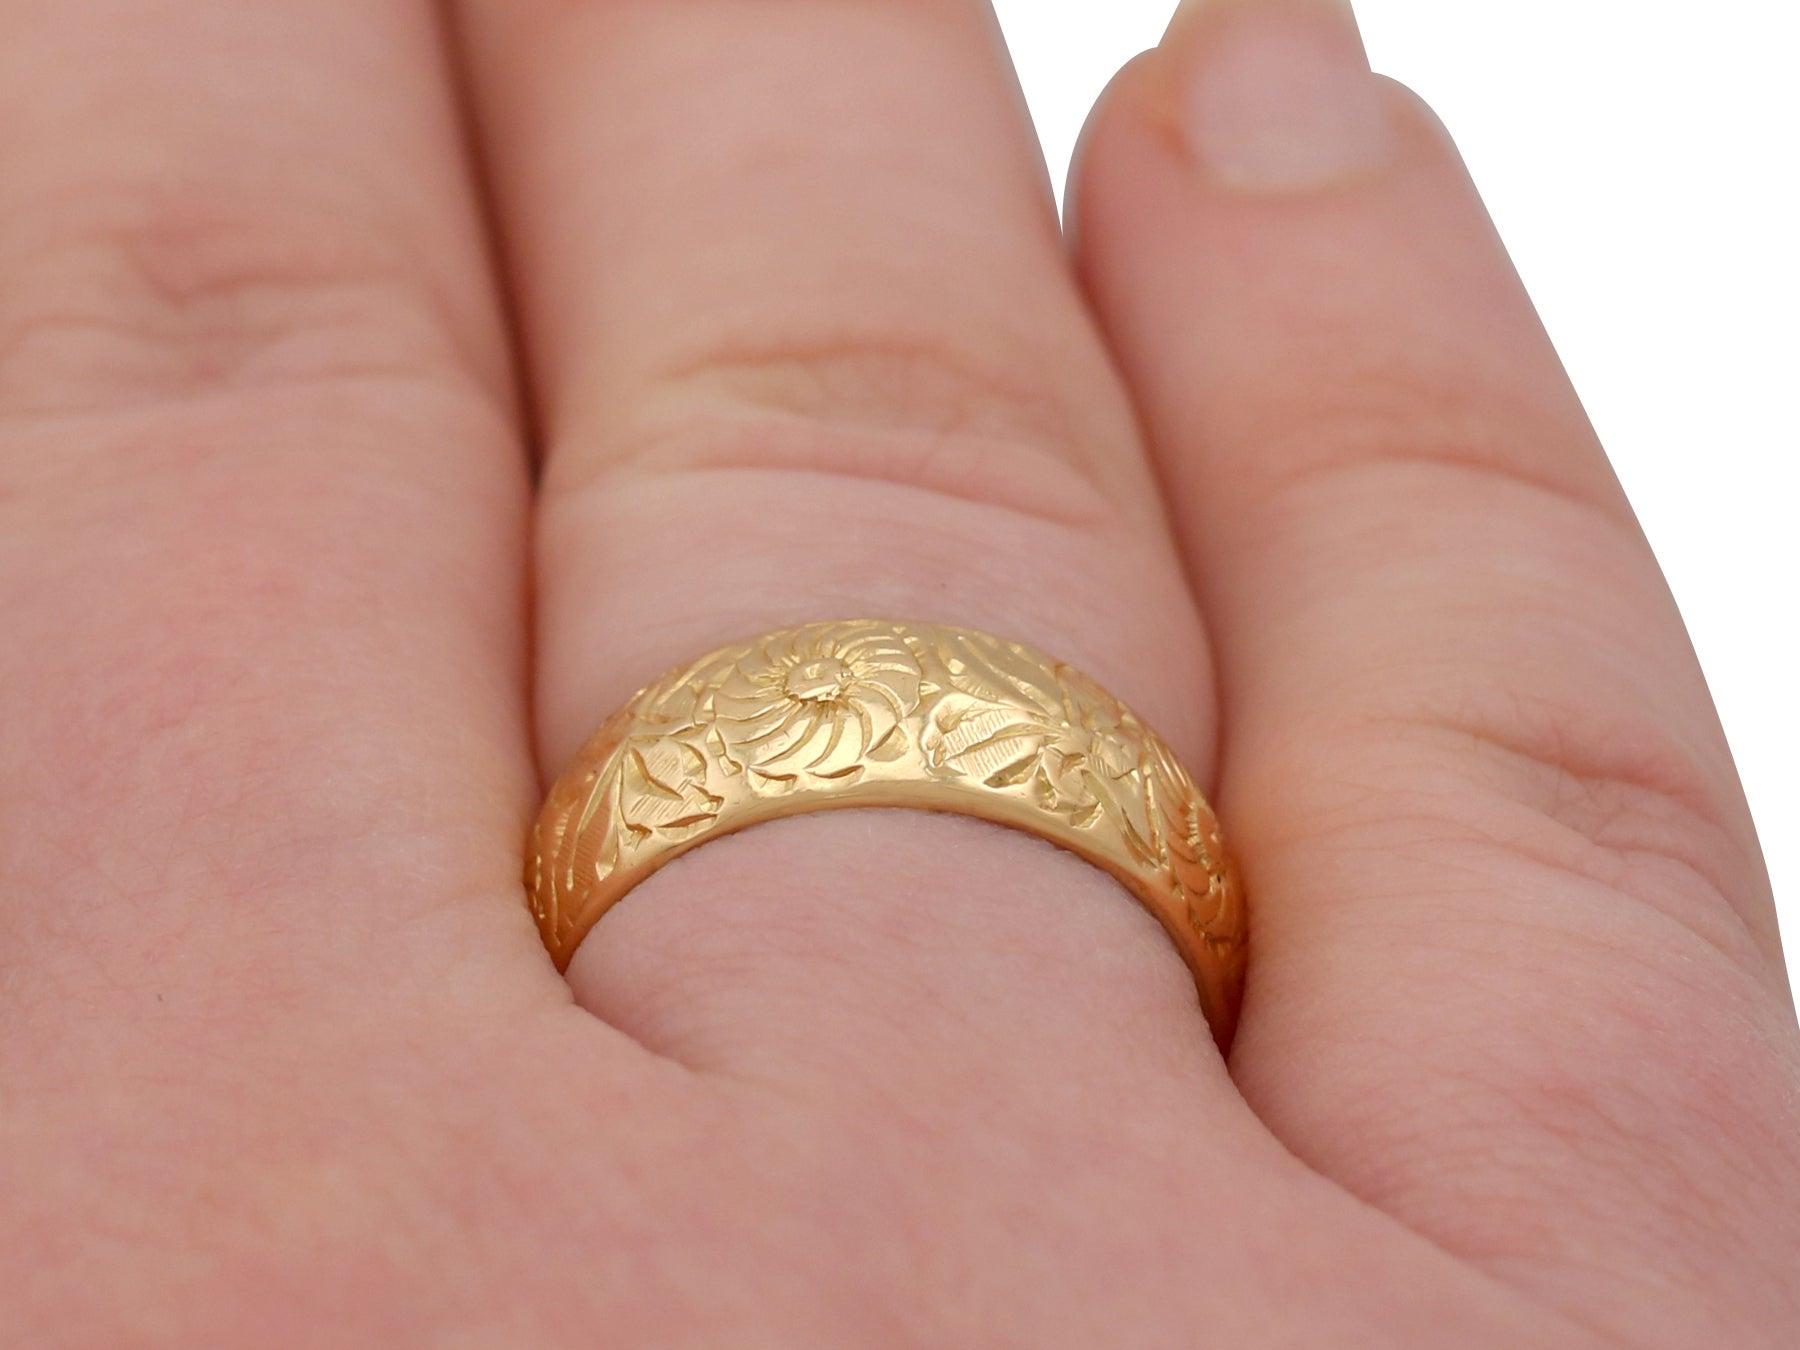 1960s Yellow Gold Wedding Band Ring at 1stdibs